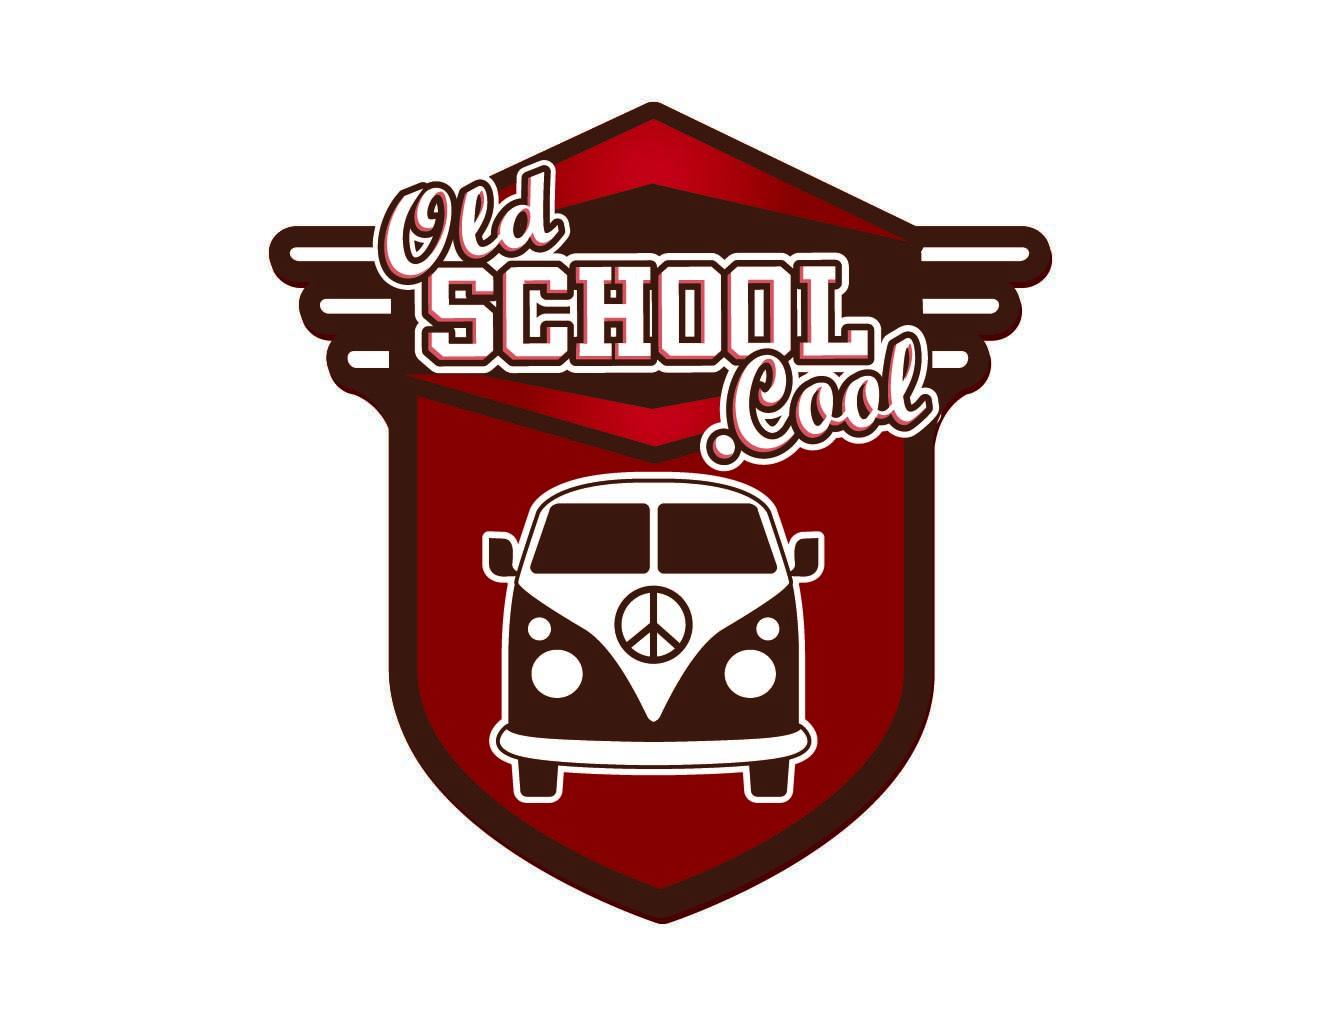 Vector Design for OldSchool.cool by radleon : Design #3602897